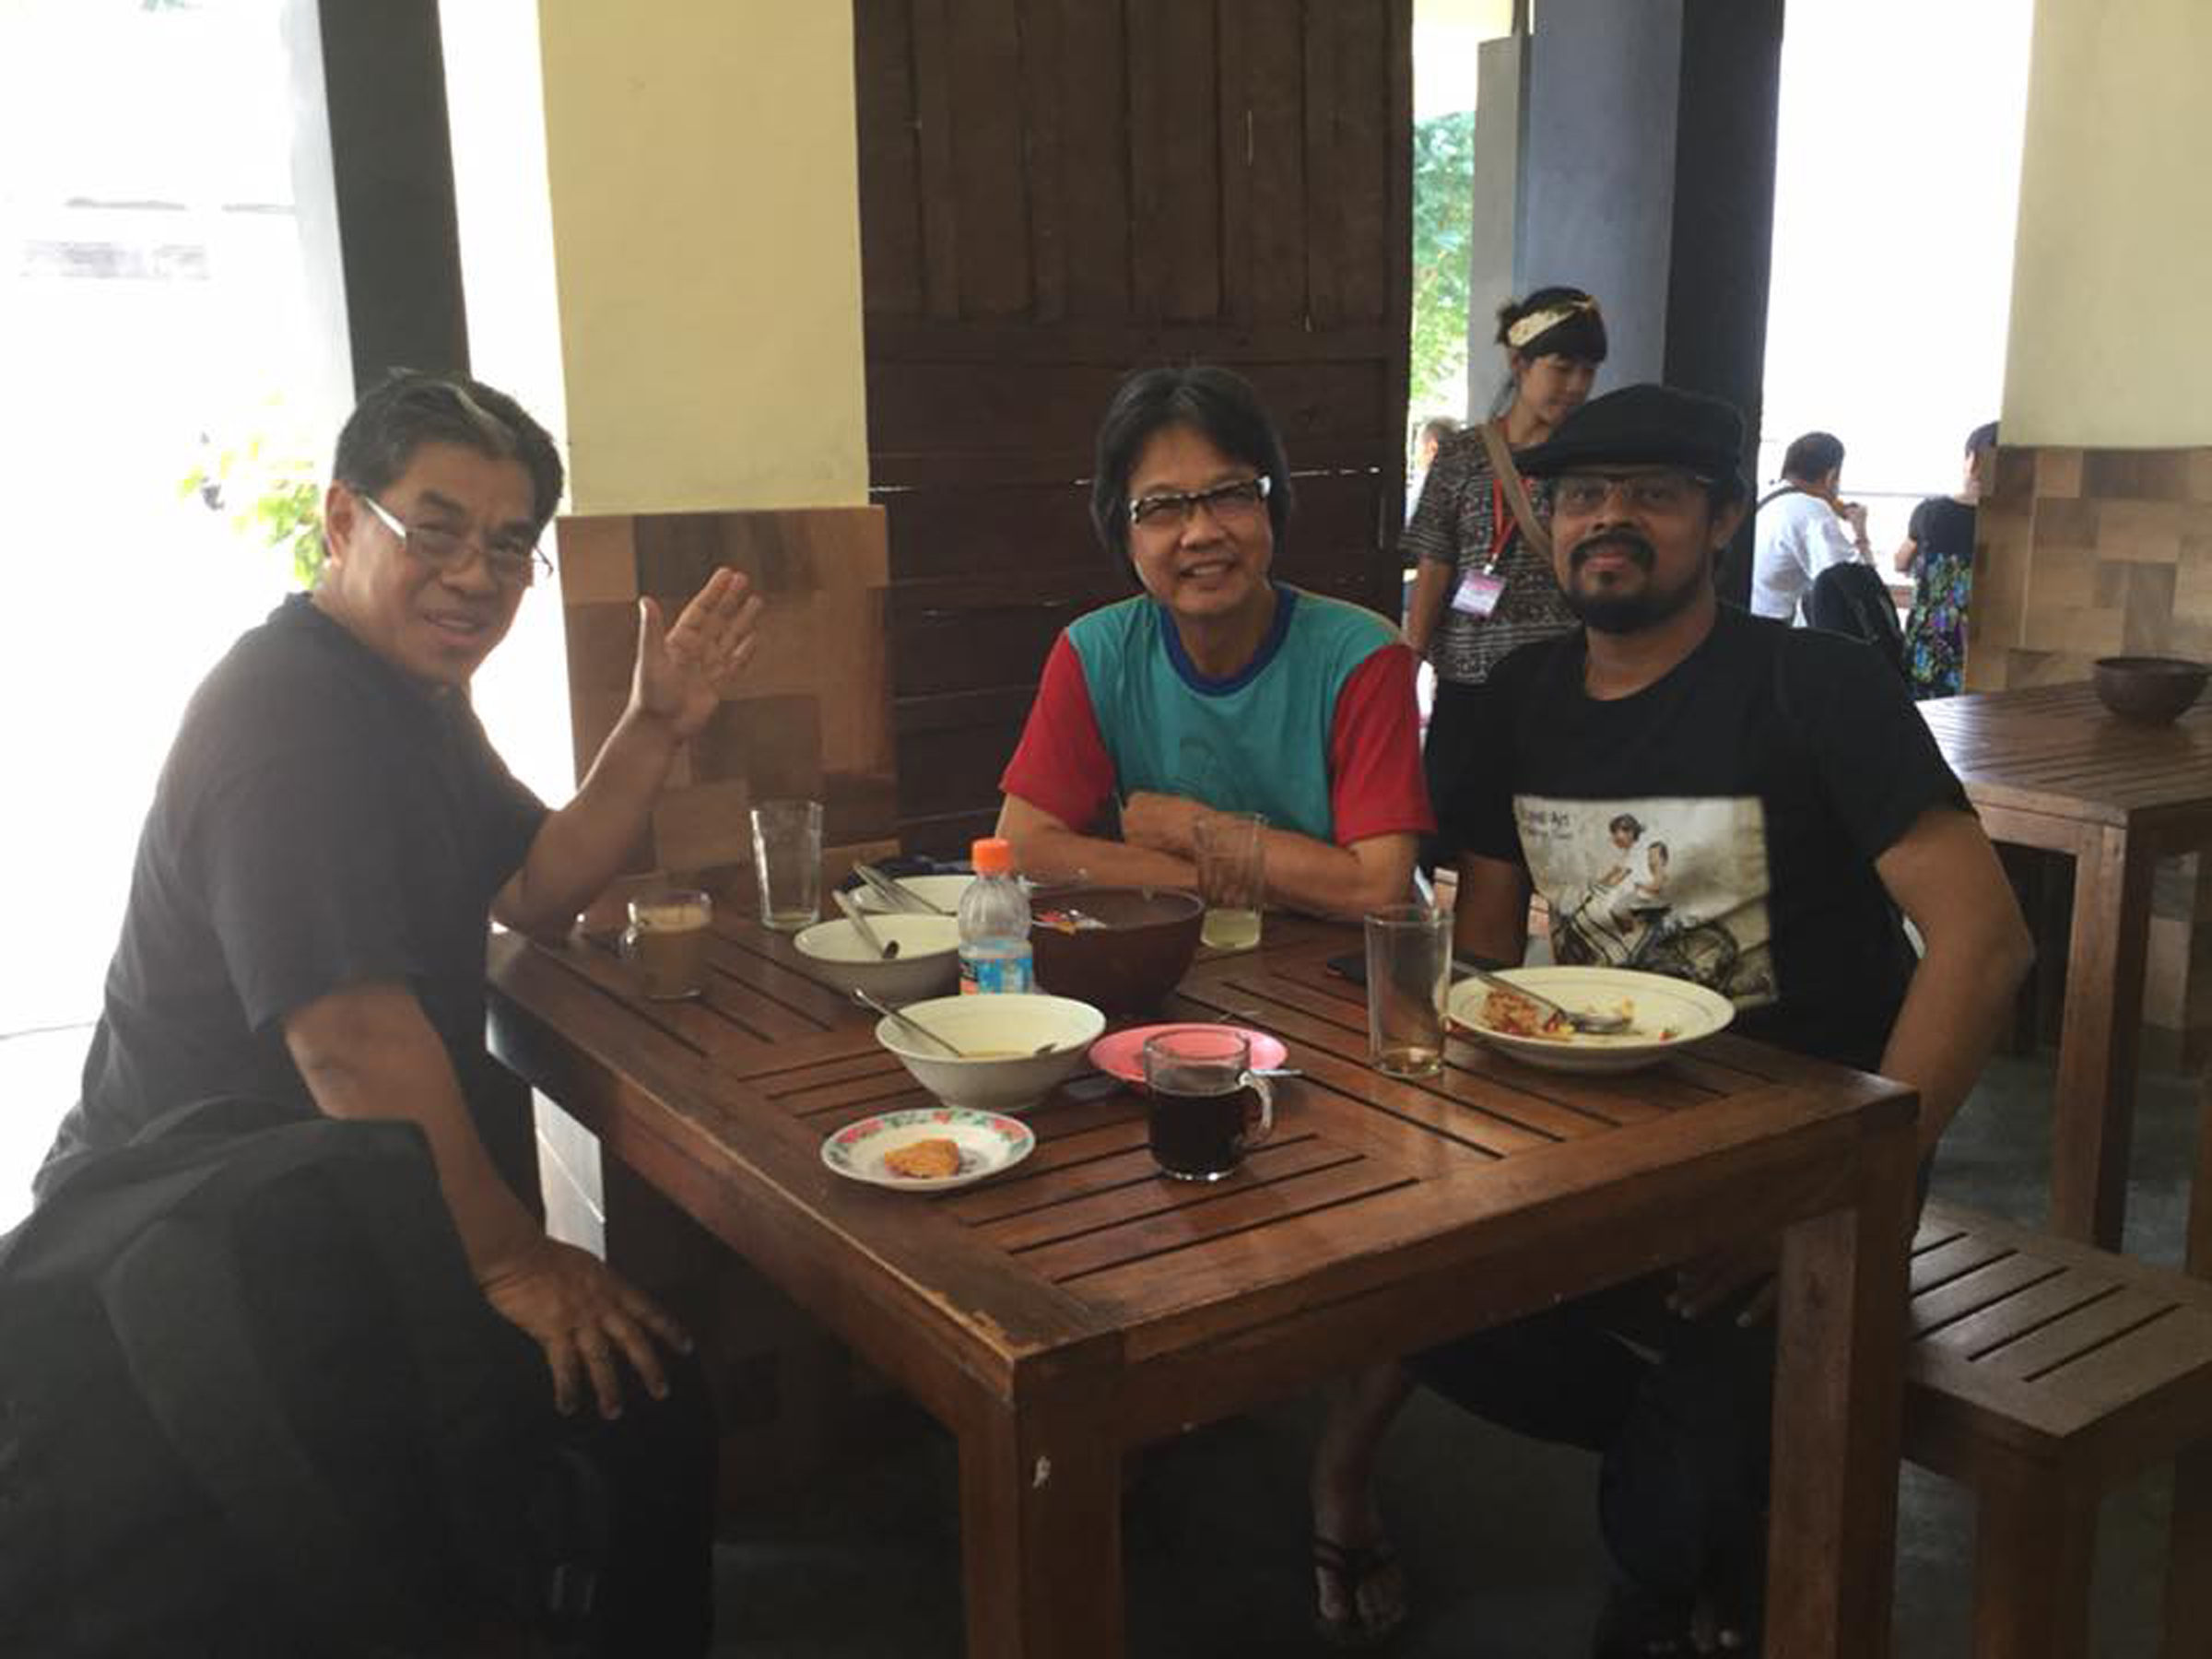 d_Meal time w Rahman_Bee_Asit.jpg